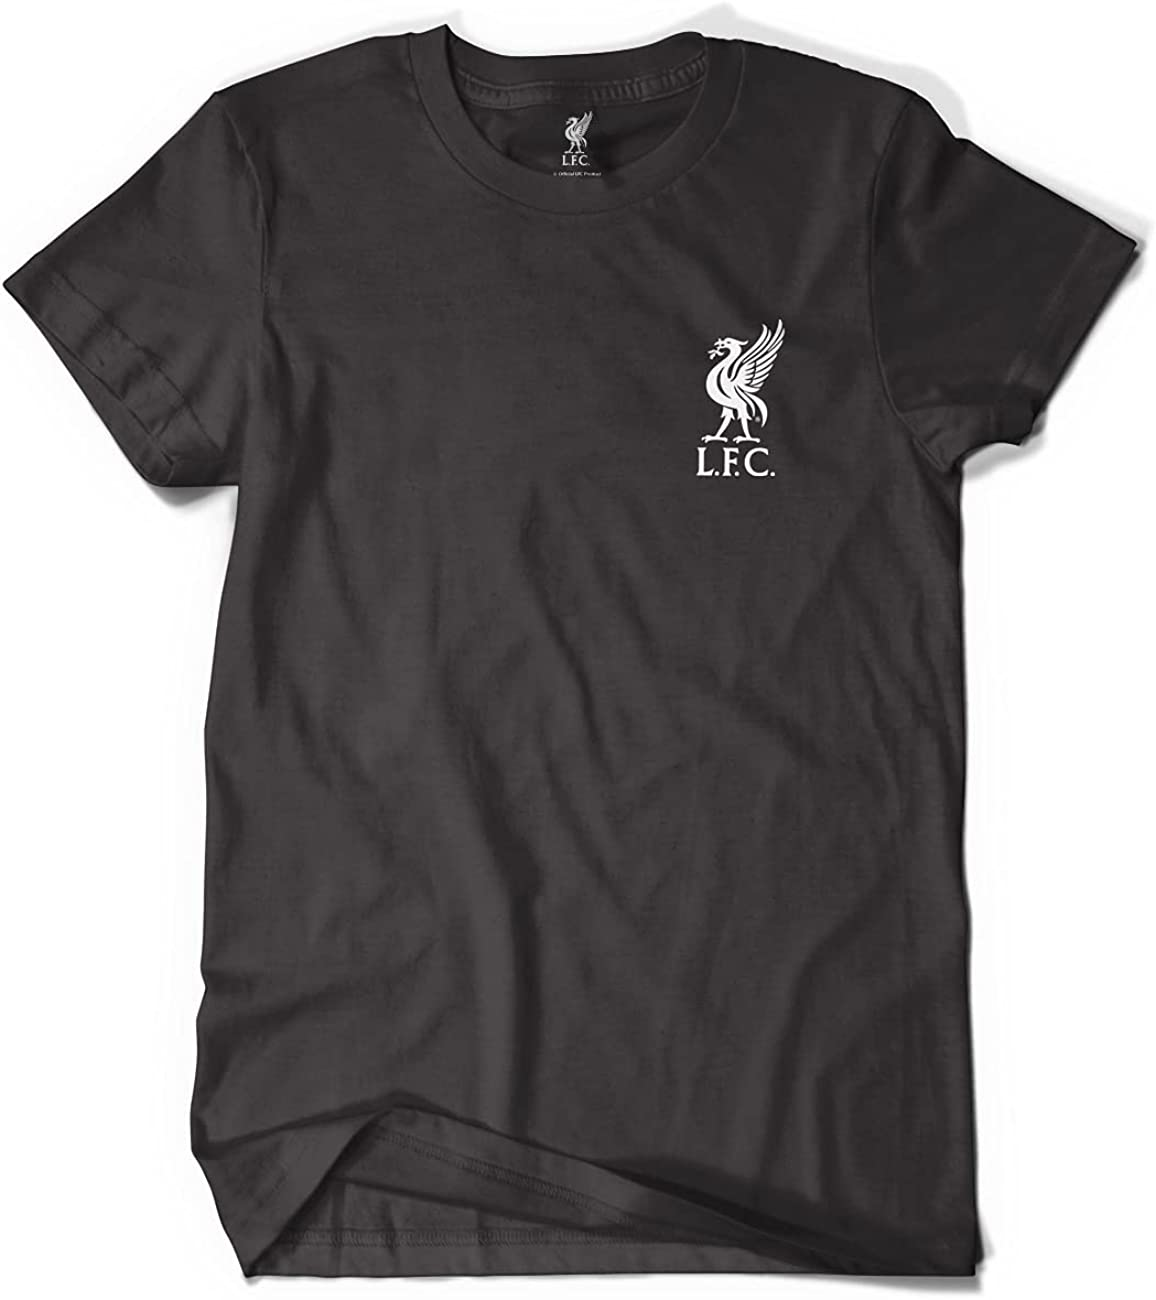 Liverpool FC Official Black Classic T-Shirt